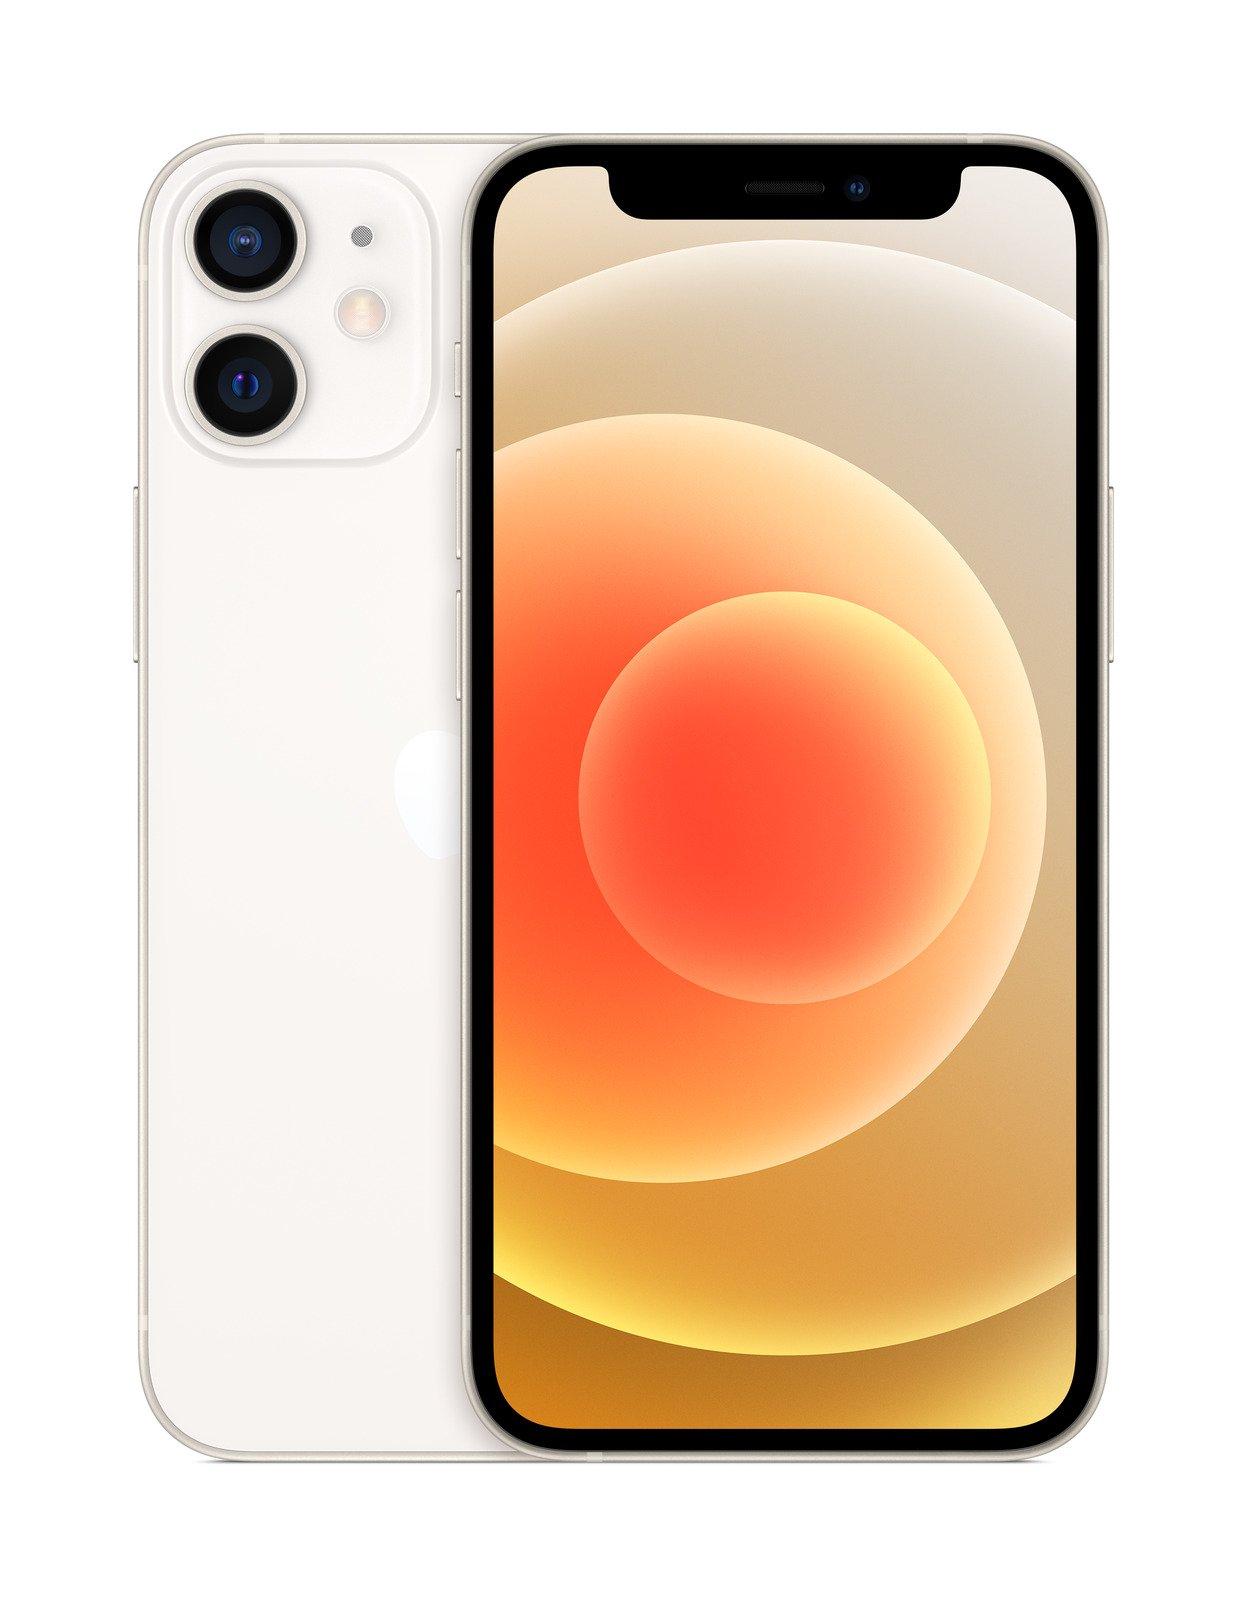 Apple iPhone 12 mini 64GB weis (Super Retina XDR Display, 5G, 4K Videoaufnahme, MGDY3ZD/A) Mobilais Telefons